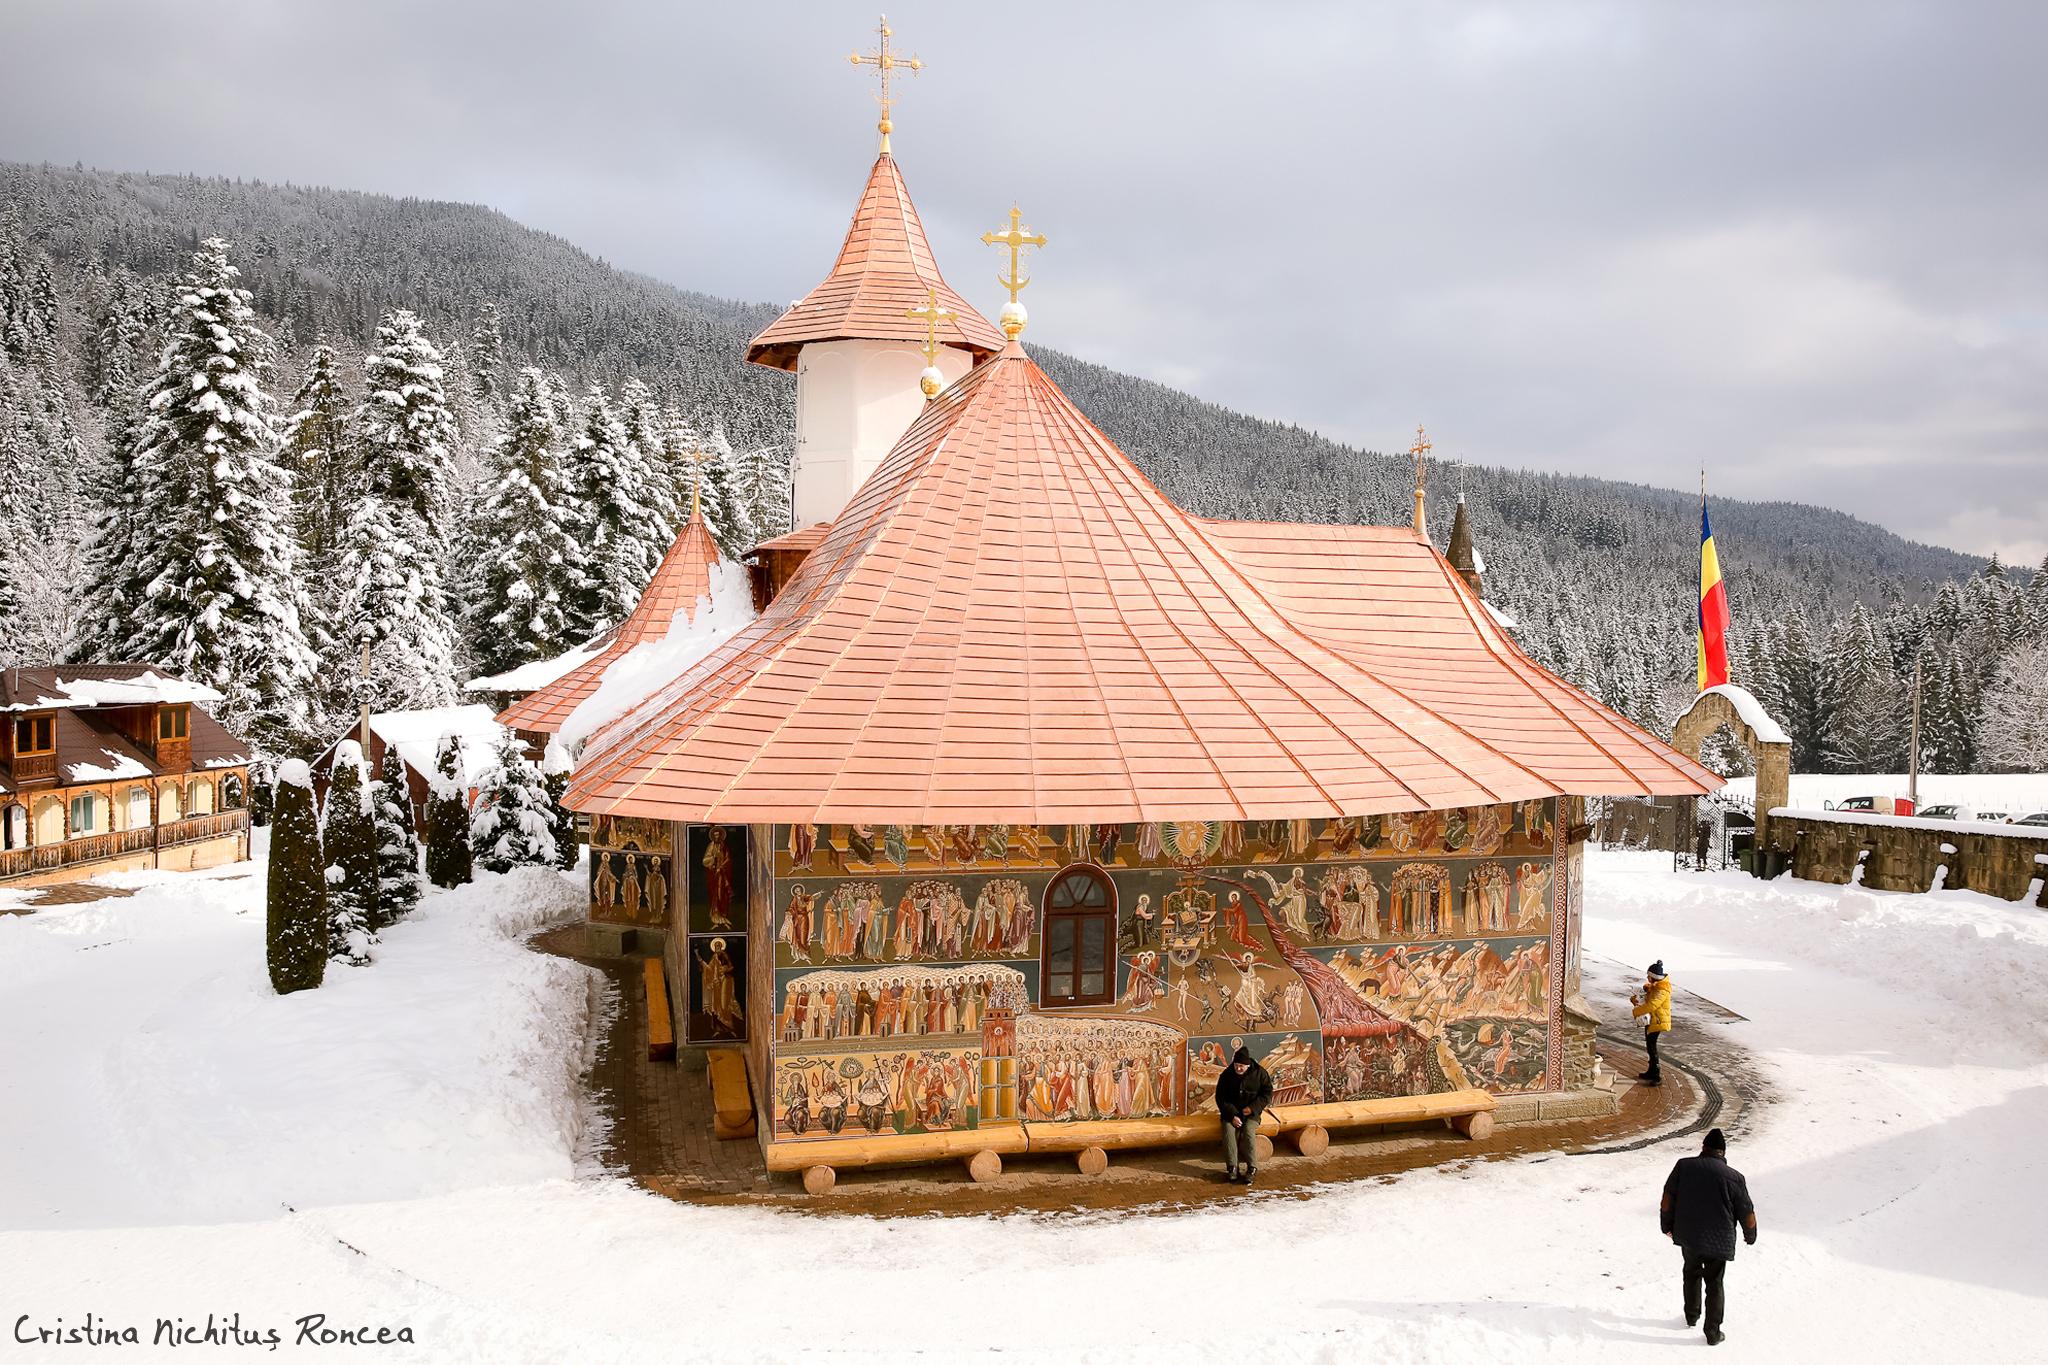 Manastirea Petru-Voda - foto Cristina Nichitus Roncea